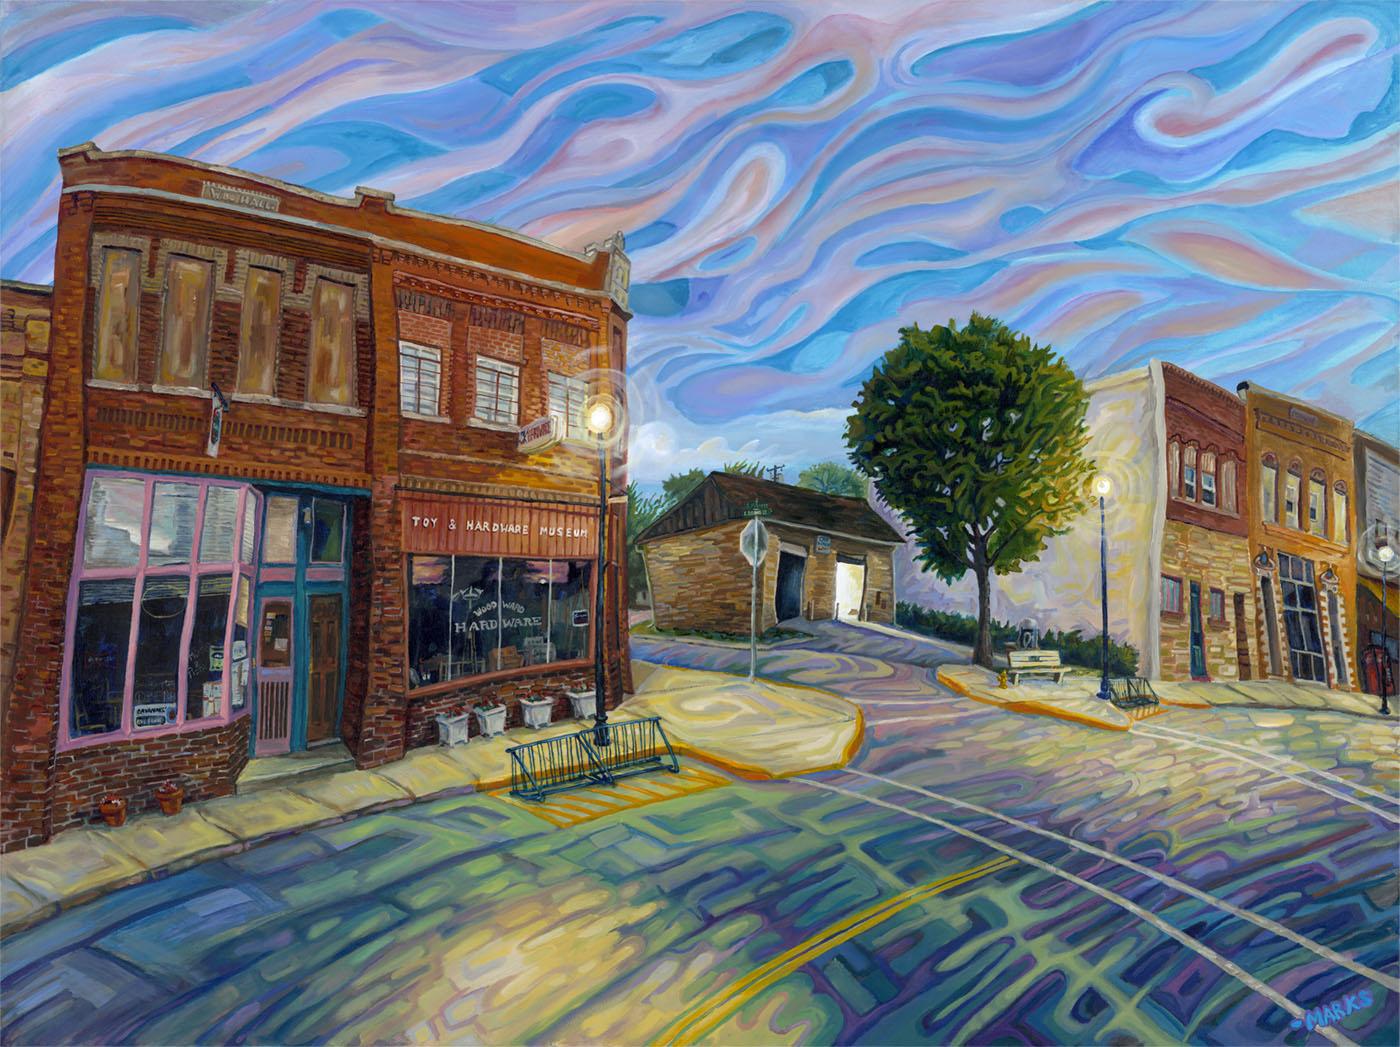 Woodward Dusk - 48 x 36 - Acrylic on Canvas $5,500